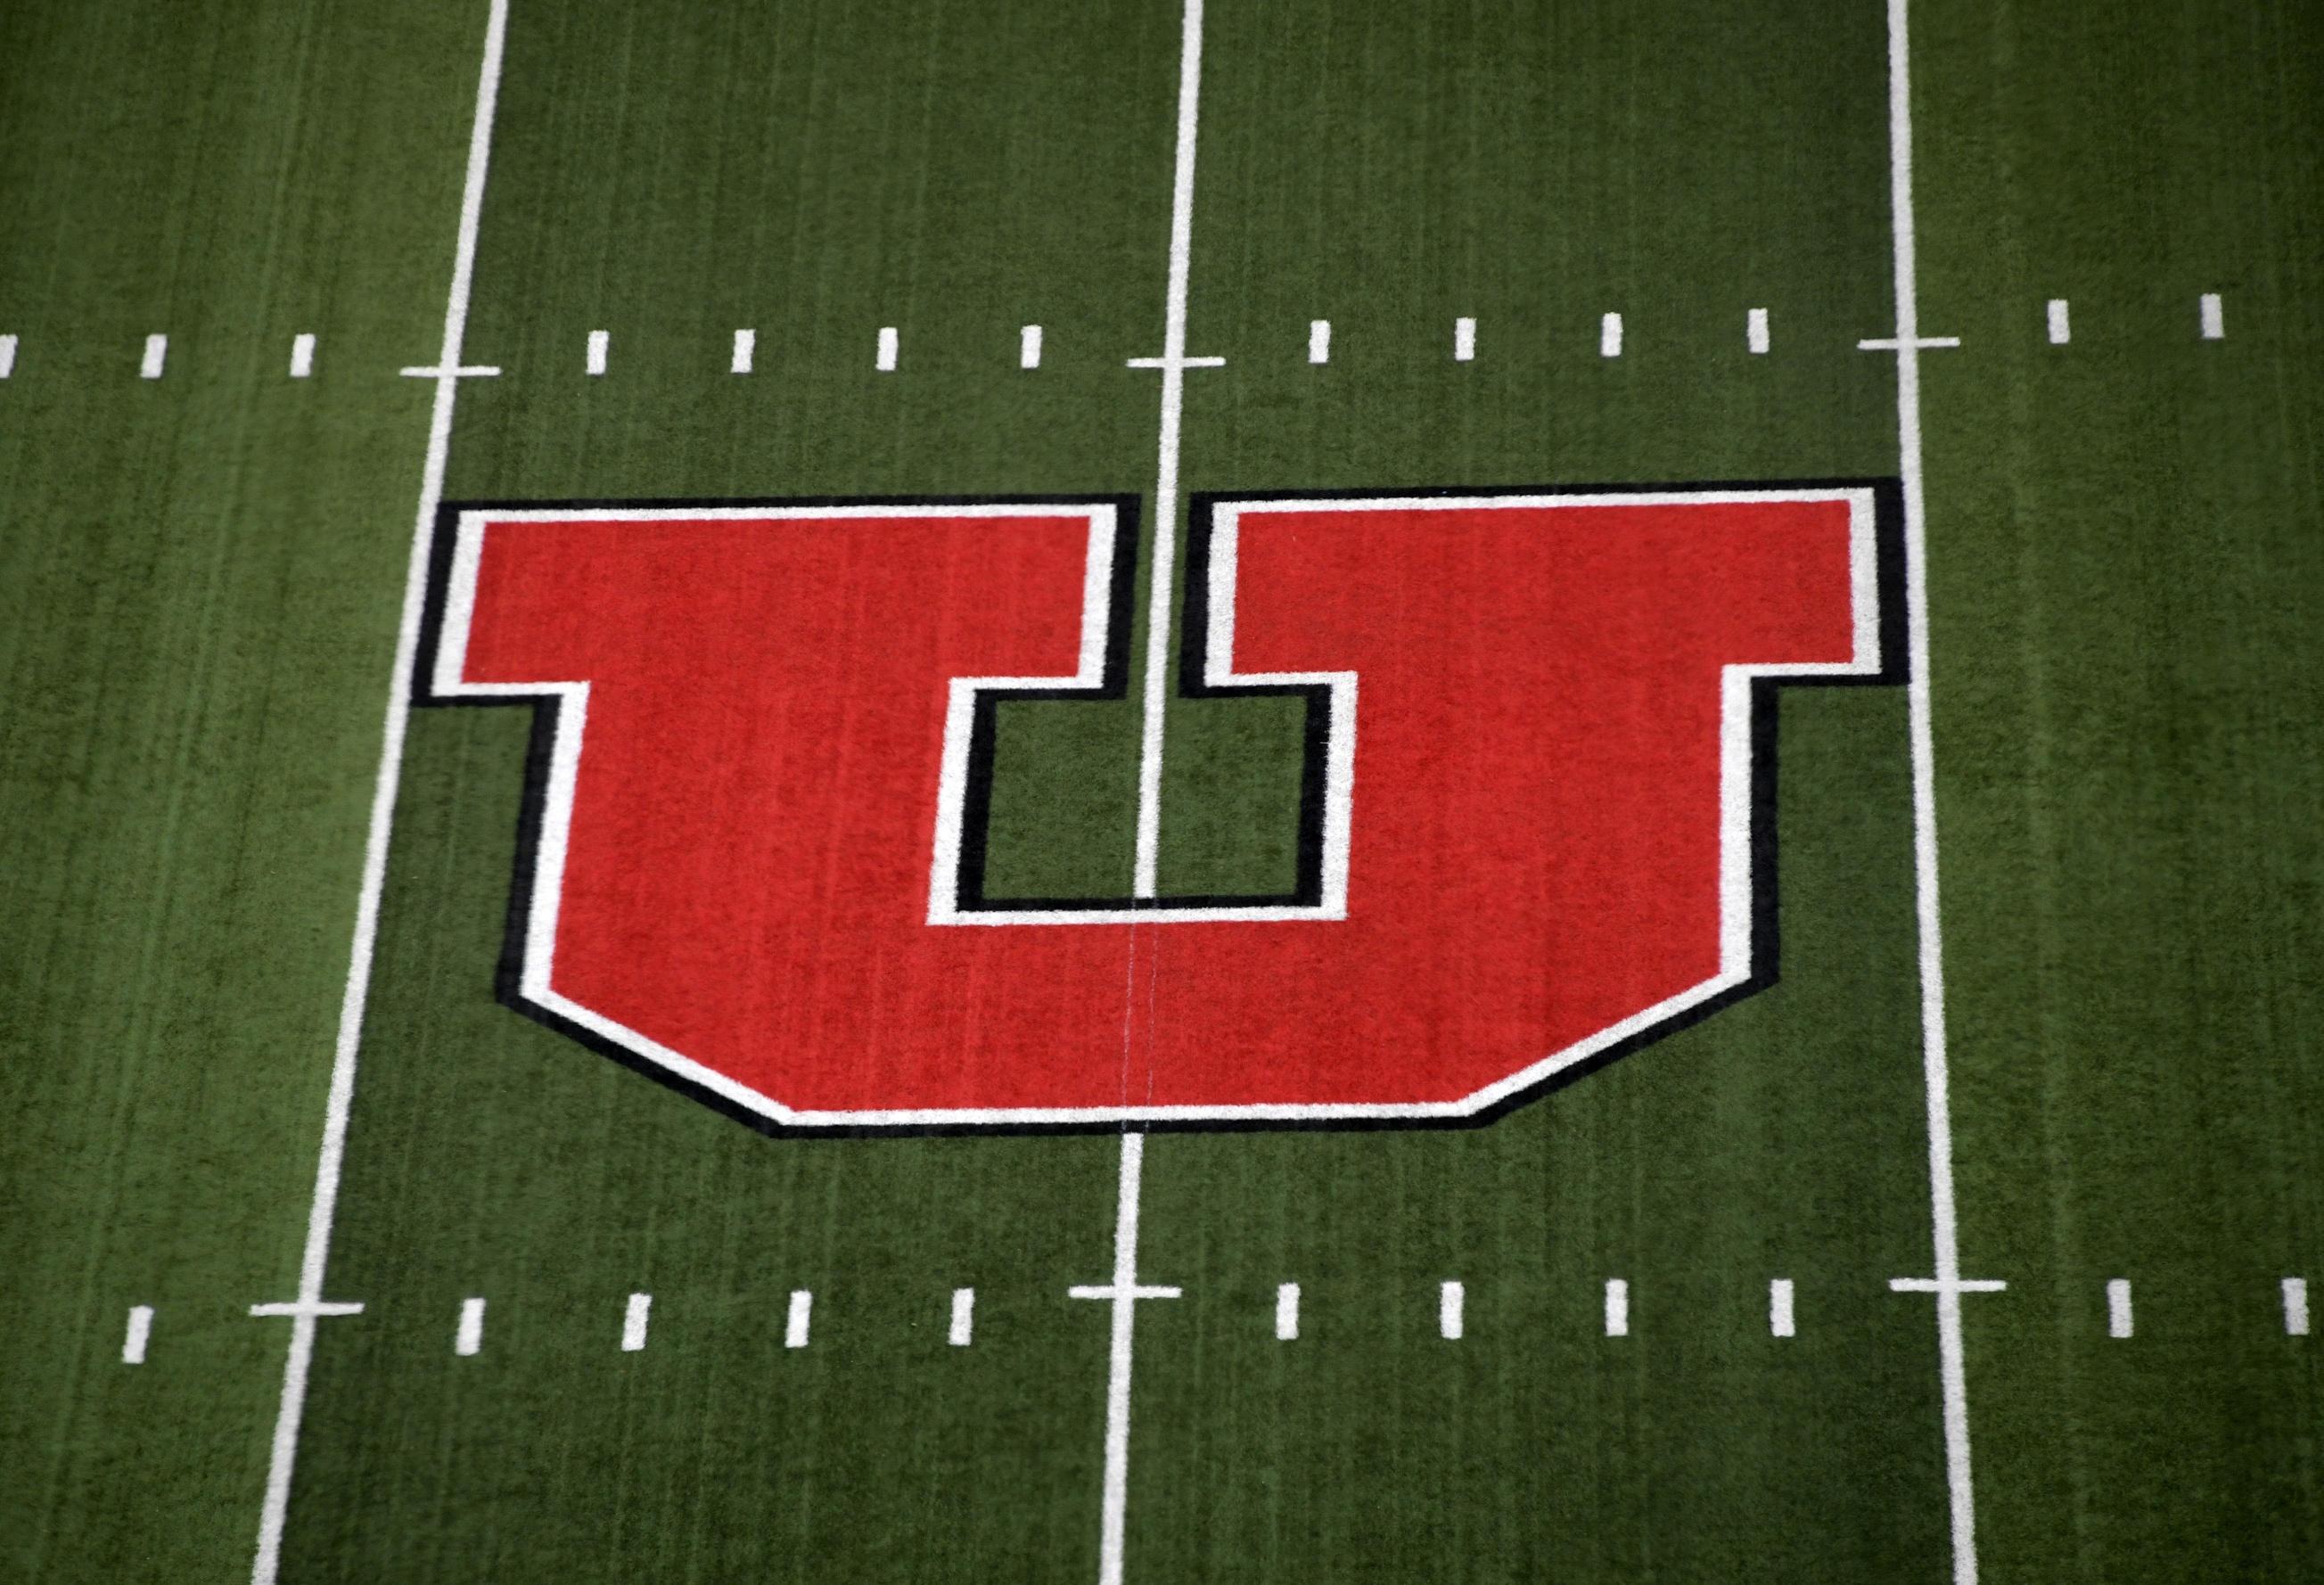 video game scholarships, Utah Utes general